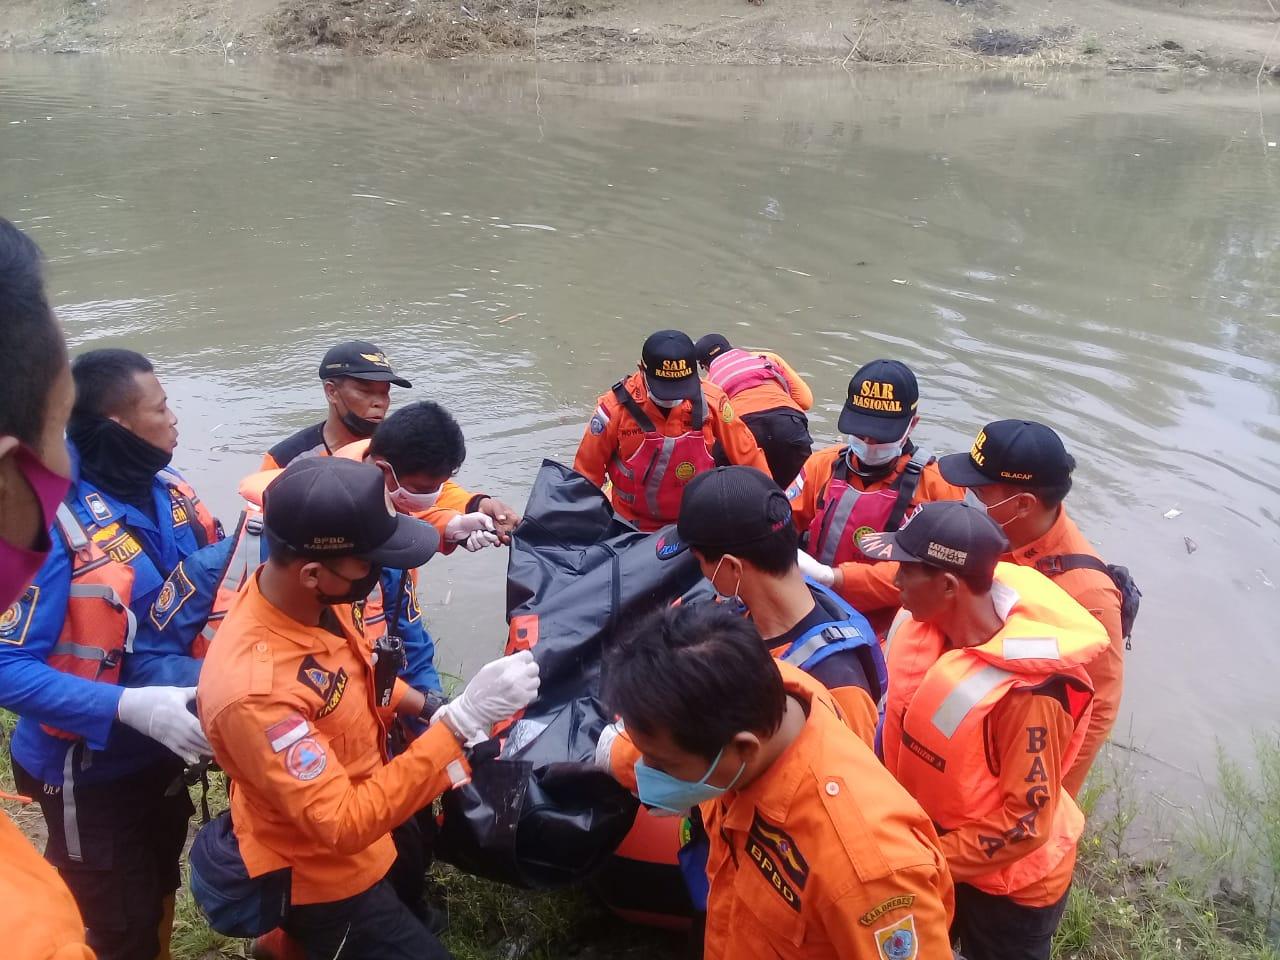 Petugas Gabungan Berhasil Mengevakuasi Bocah Tenggelam di Sungai Pemali Brebes Jawa Tengah